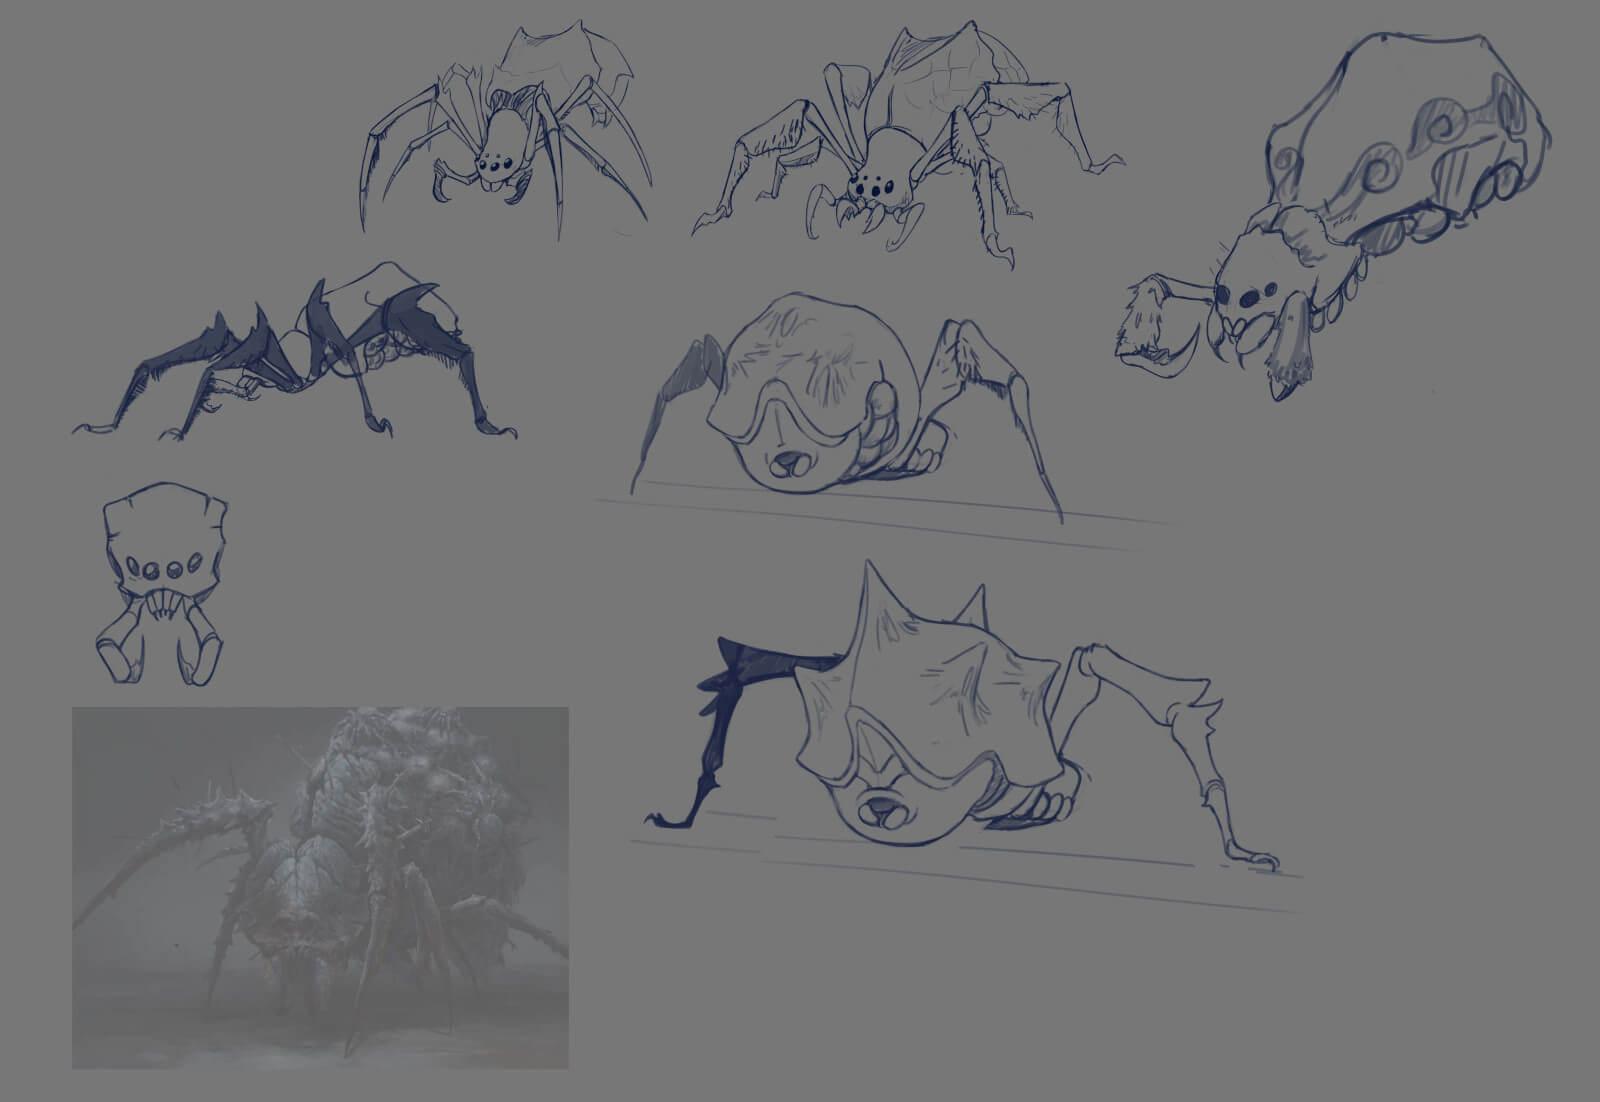 Spider monster sketches